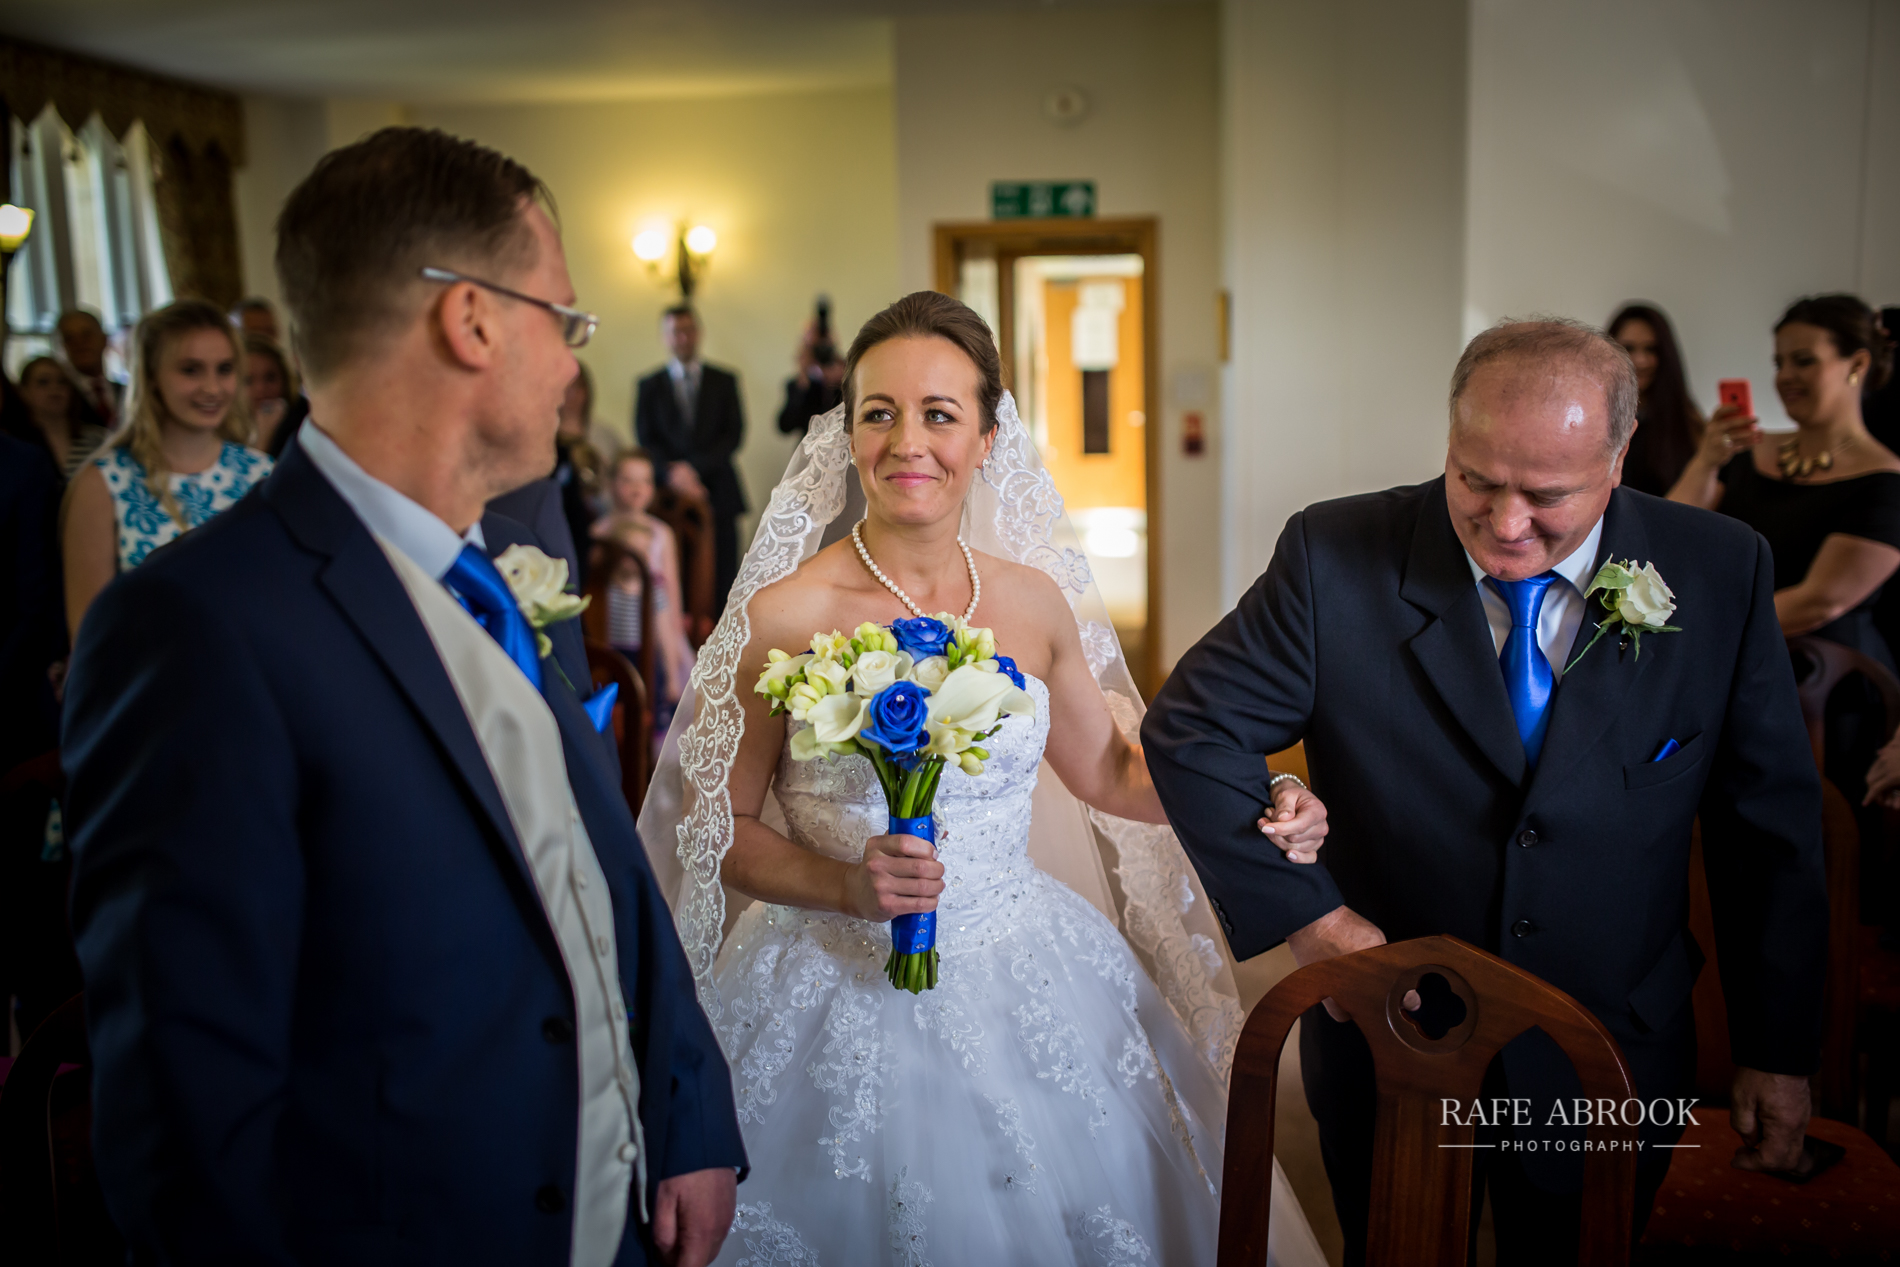 agnes & laurence wedding kings lodge hotel kings langley hertfordshire-1110.jpg